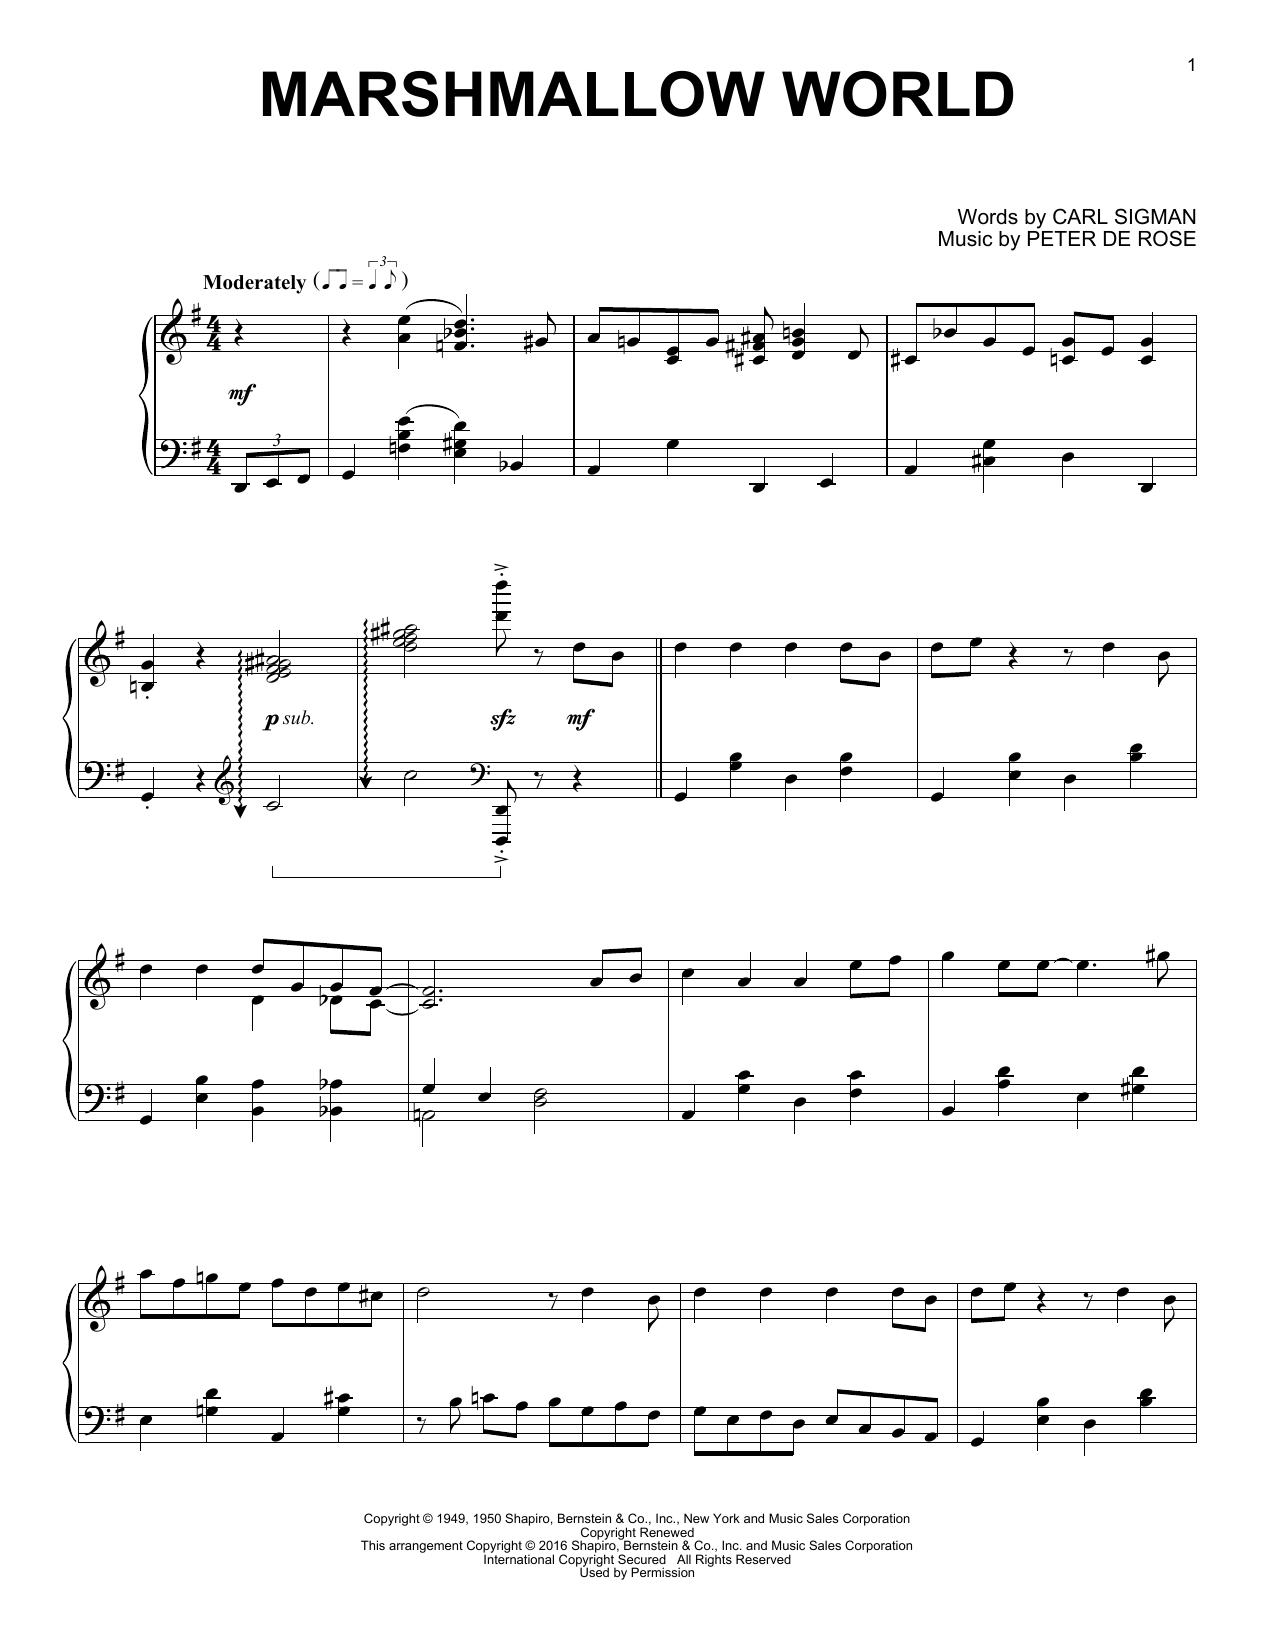 Carl Sigman A Marshmallow World sheet music notes and chords. Download Printable PDF.